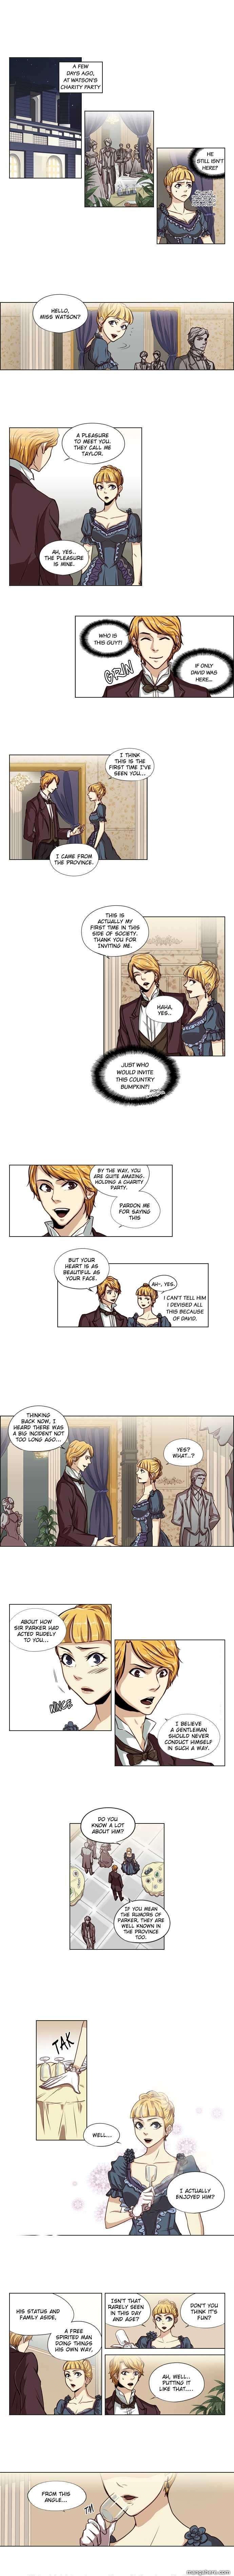 Serendipity 2 Page 1